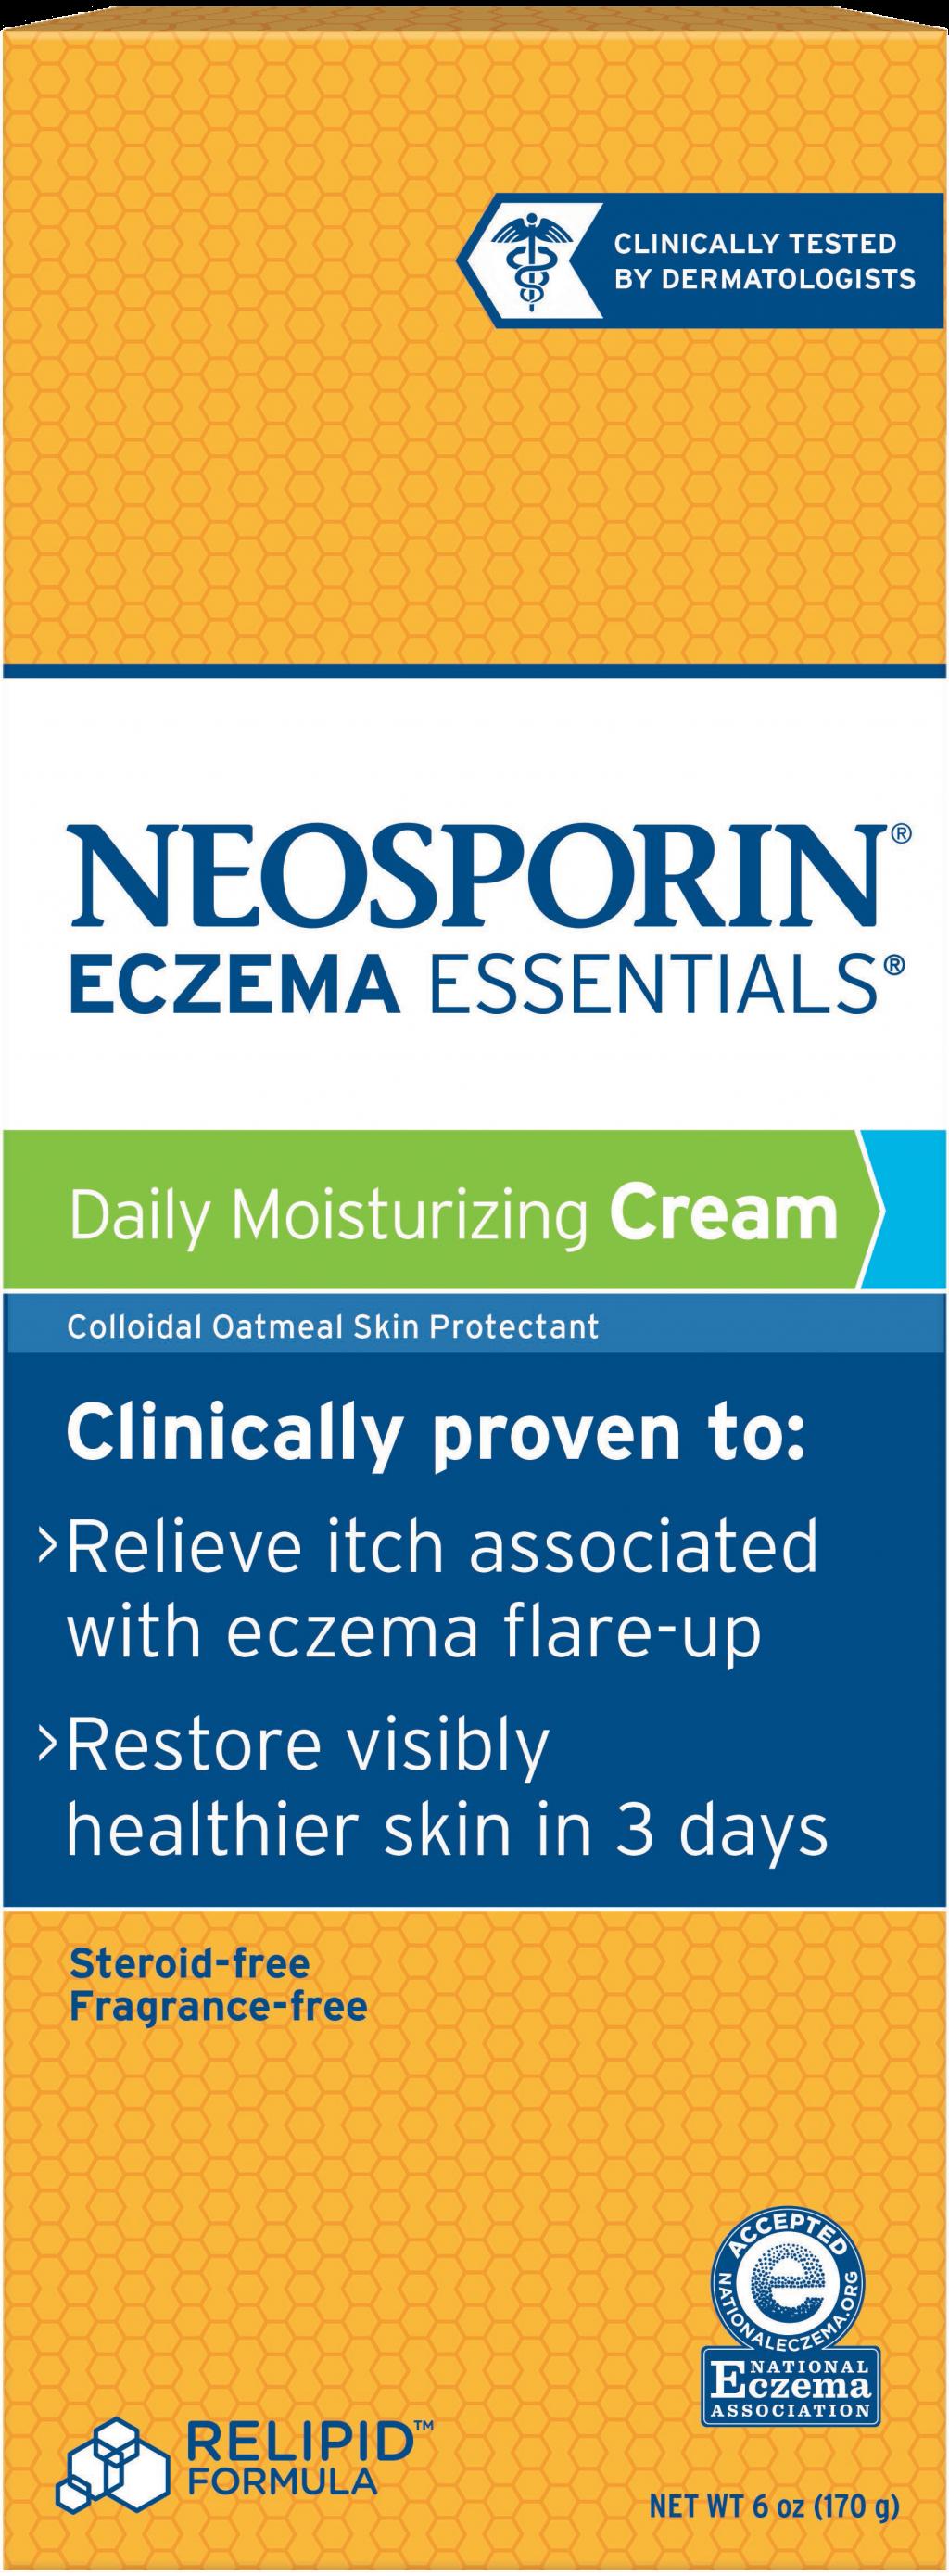 Moisturizing Eczema Treatment Cream | NEOSPORIN®